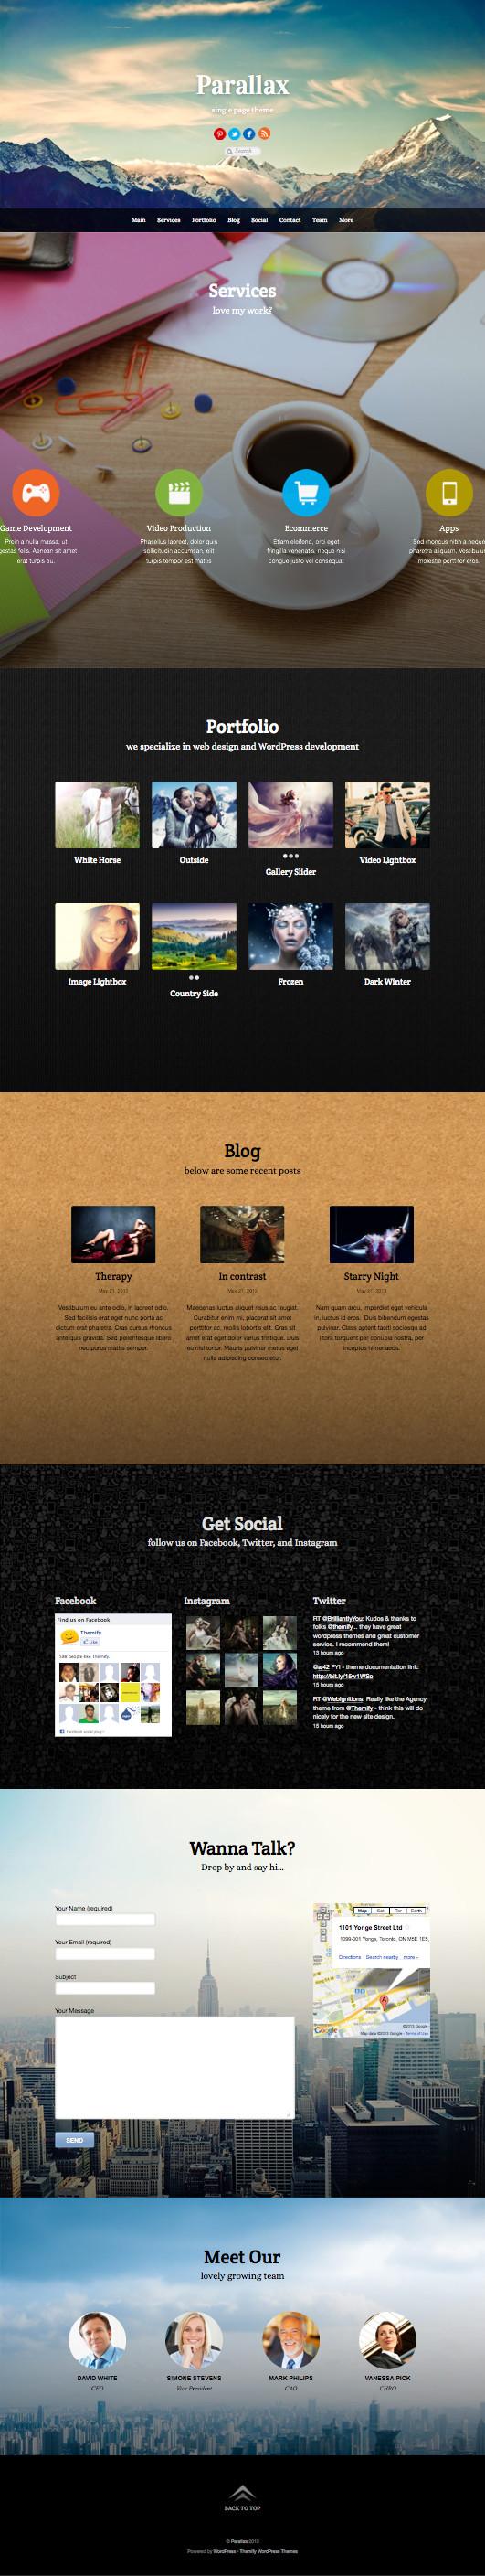 Parallax WordPress Single Page Scrolling Theme